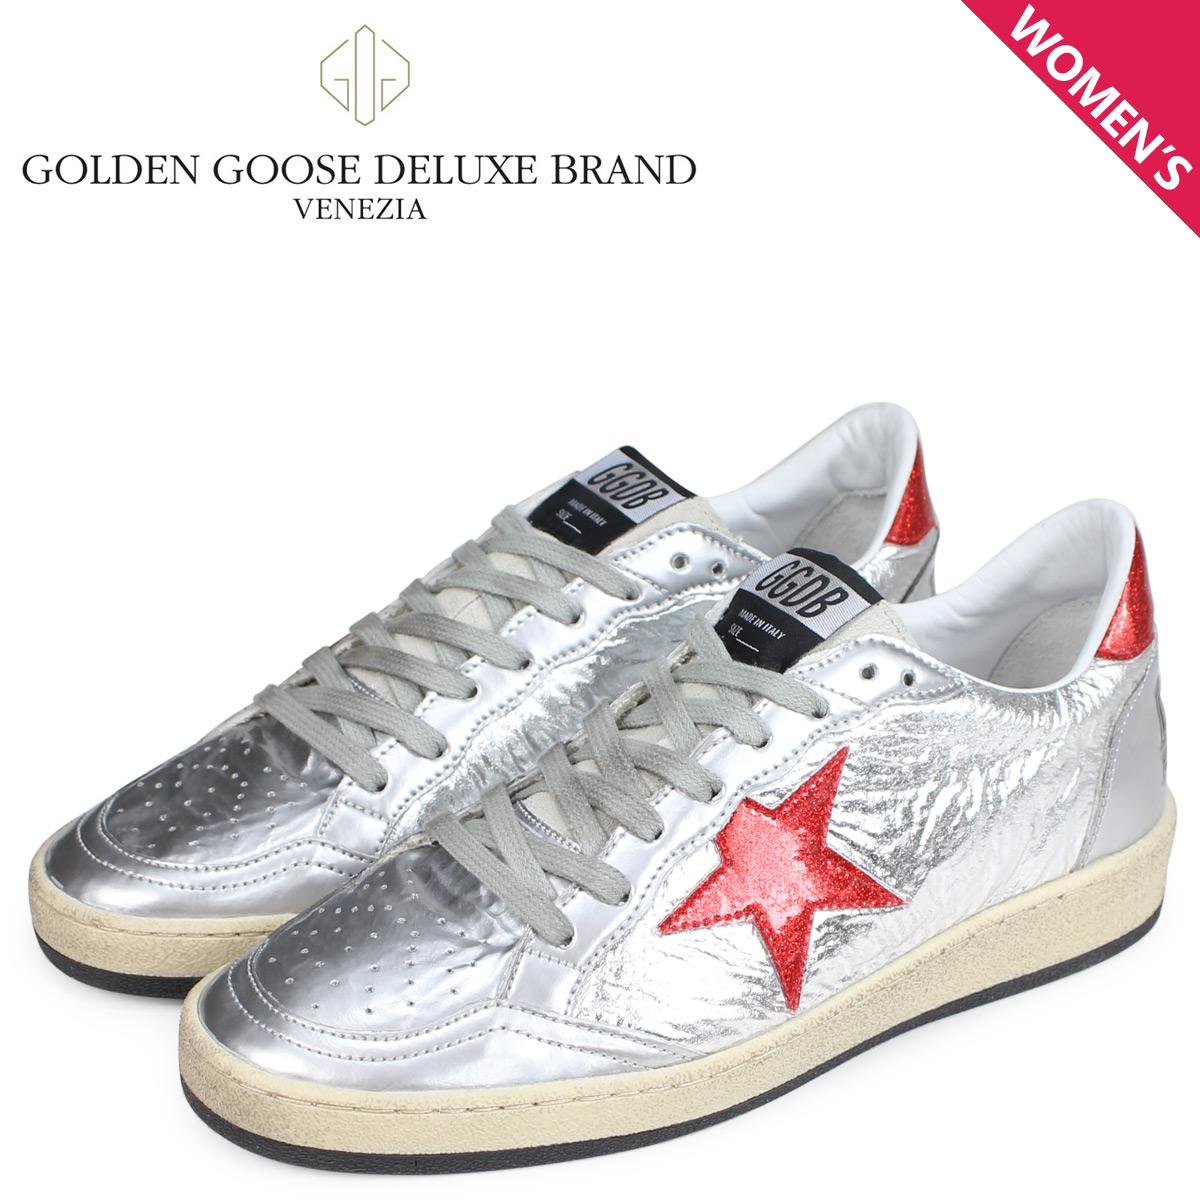 Golden Goose ゴールデングース スニーカー レディース ボールスター BALL STAR シルバー G33WS592 H2